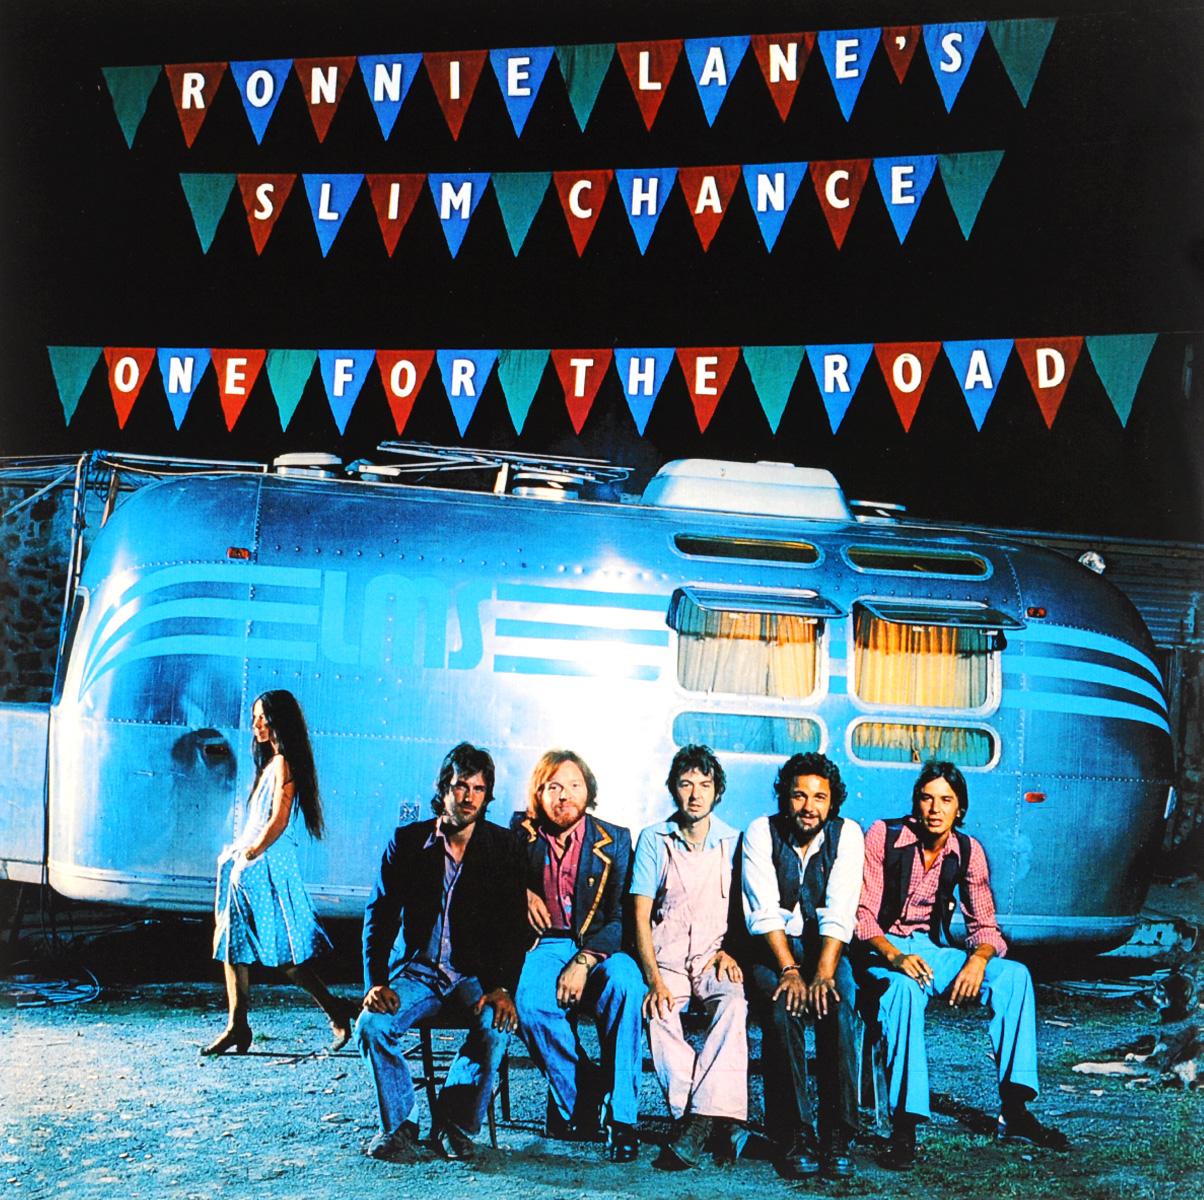 Ронни Лейн Ronnie Lane's Slim Chance. One For The Road (LP) lynyrd skynyrd lynyrd skynyrd one more from the road 2 lp